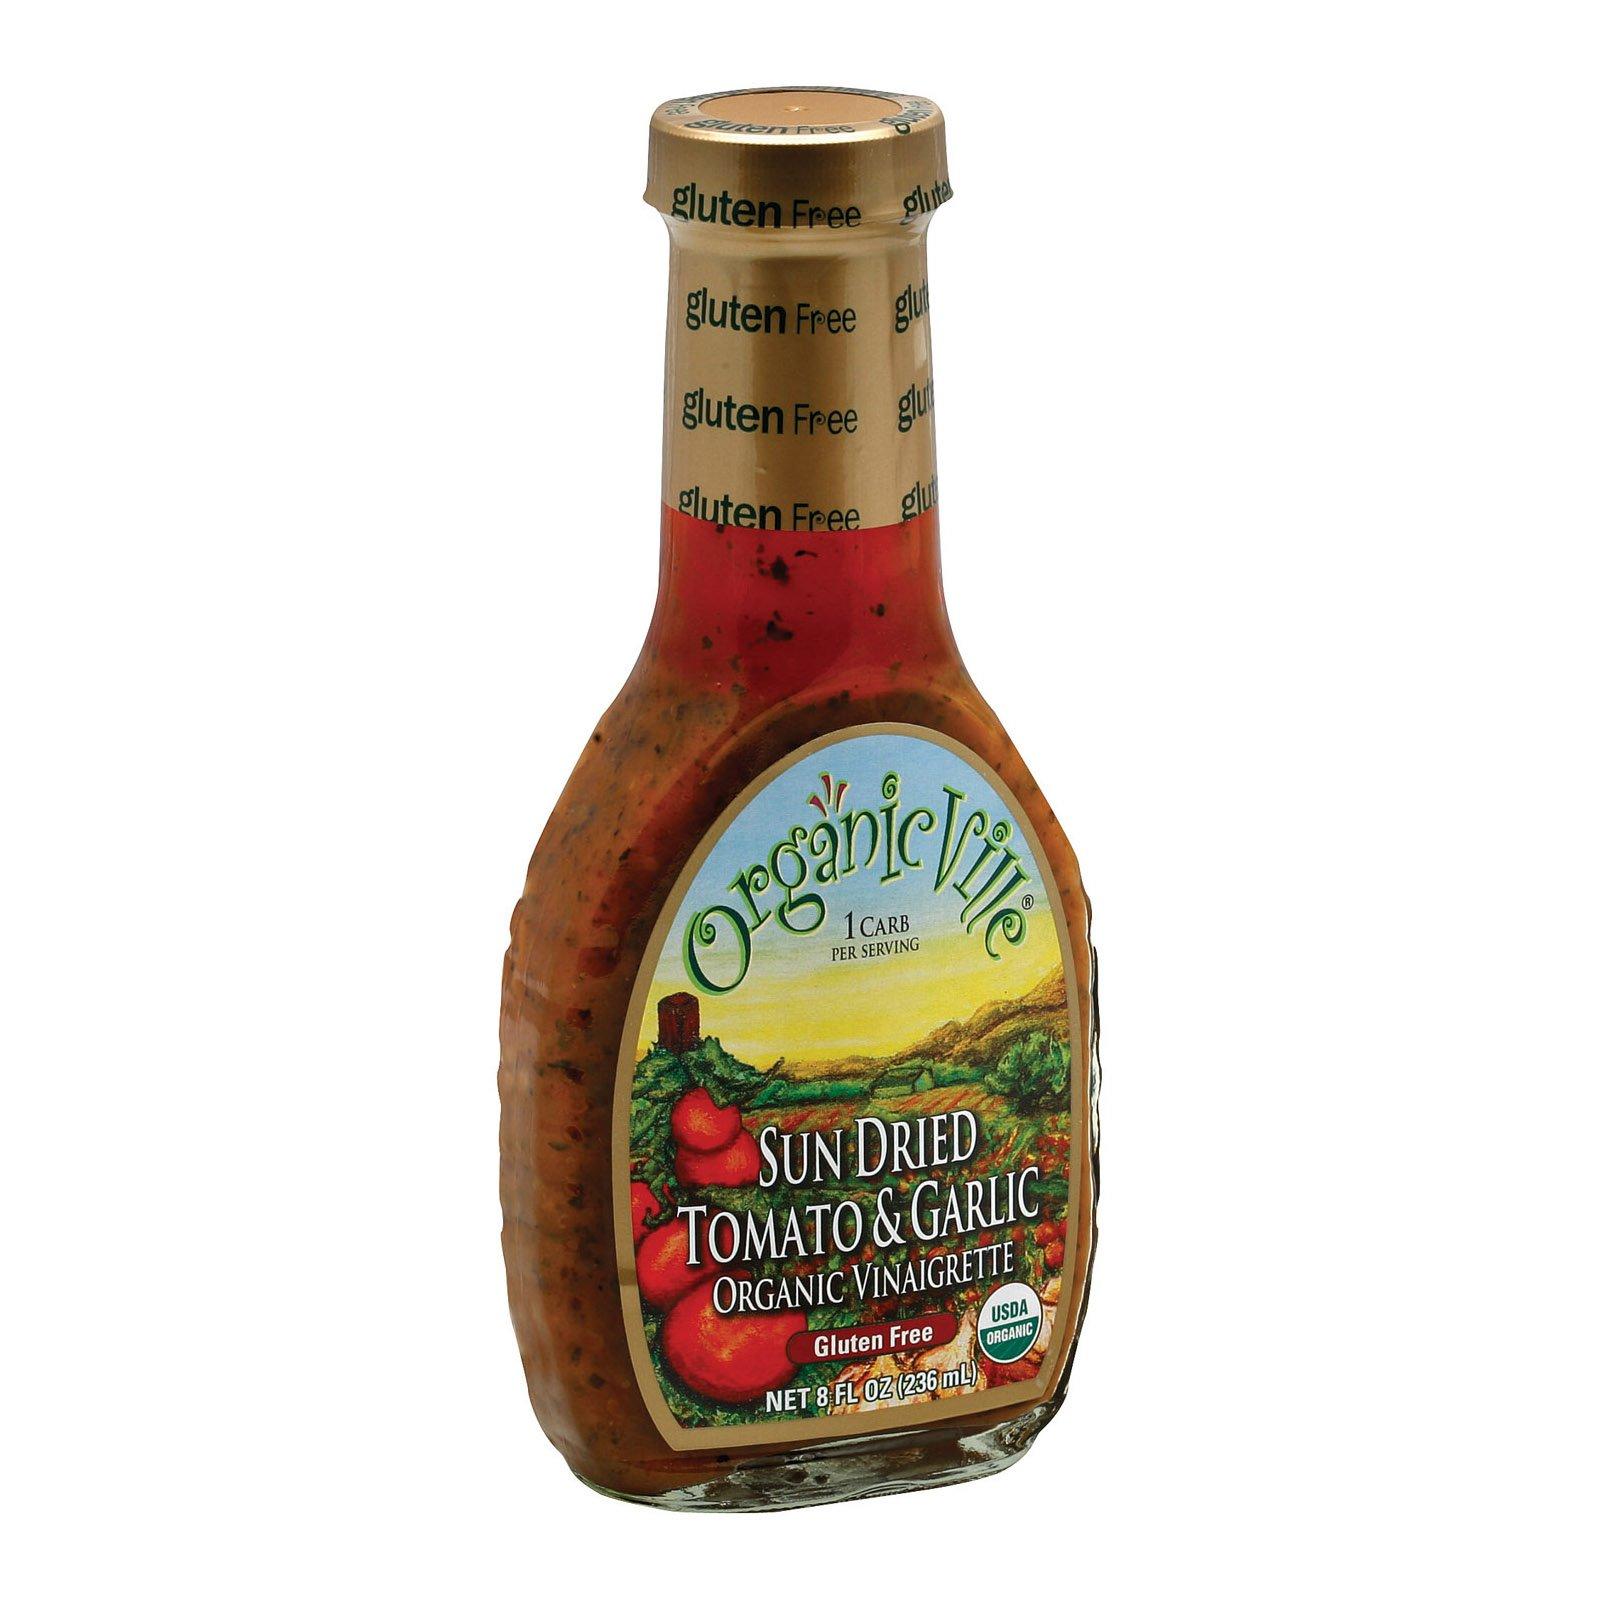 Organic Ville Sun Dried Organic Vinaigrette - Tomato and Garlic - Case of 6-8 Fl oz.